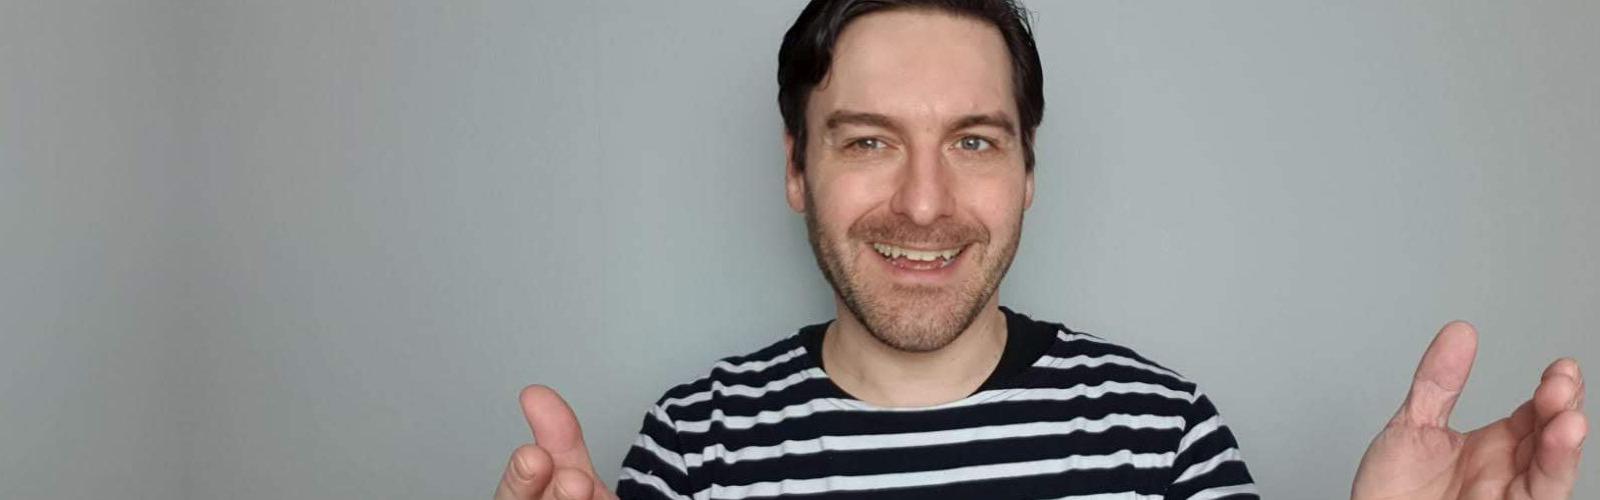 kreativbegeistert Stephan Valats - Experte für Kreativität, Innovation und Ideenfindung